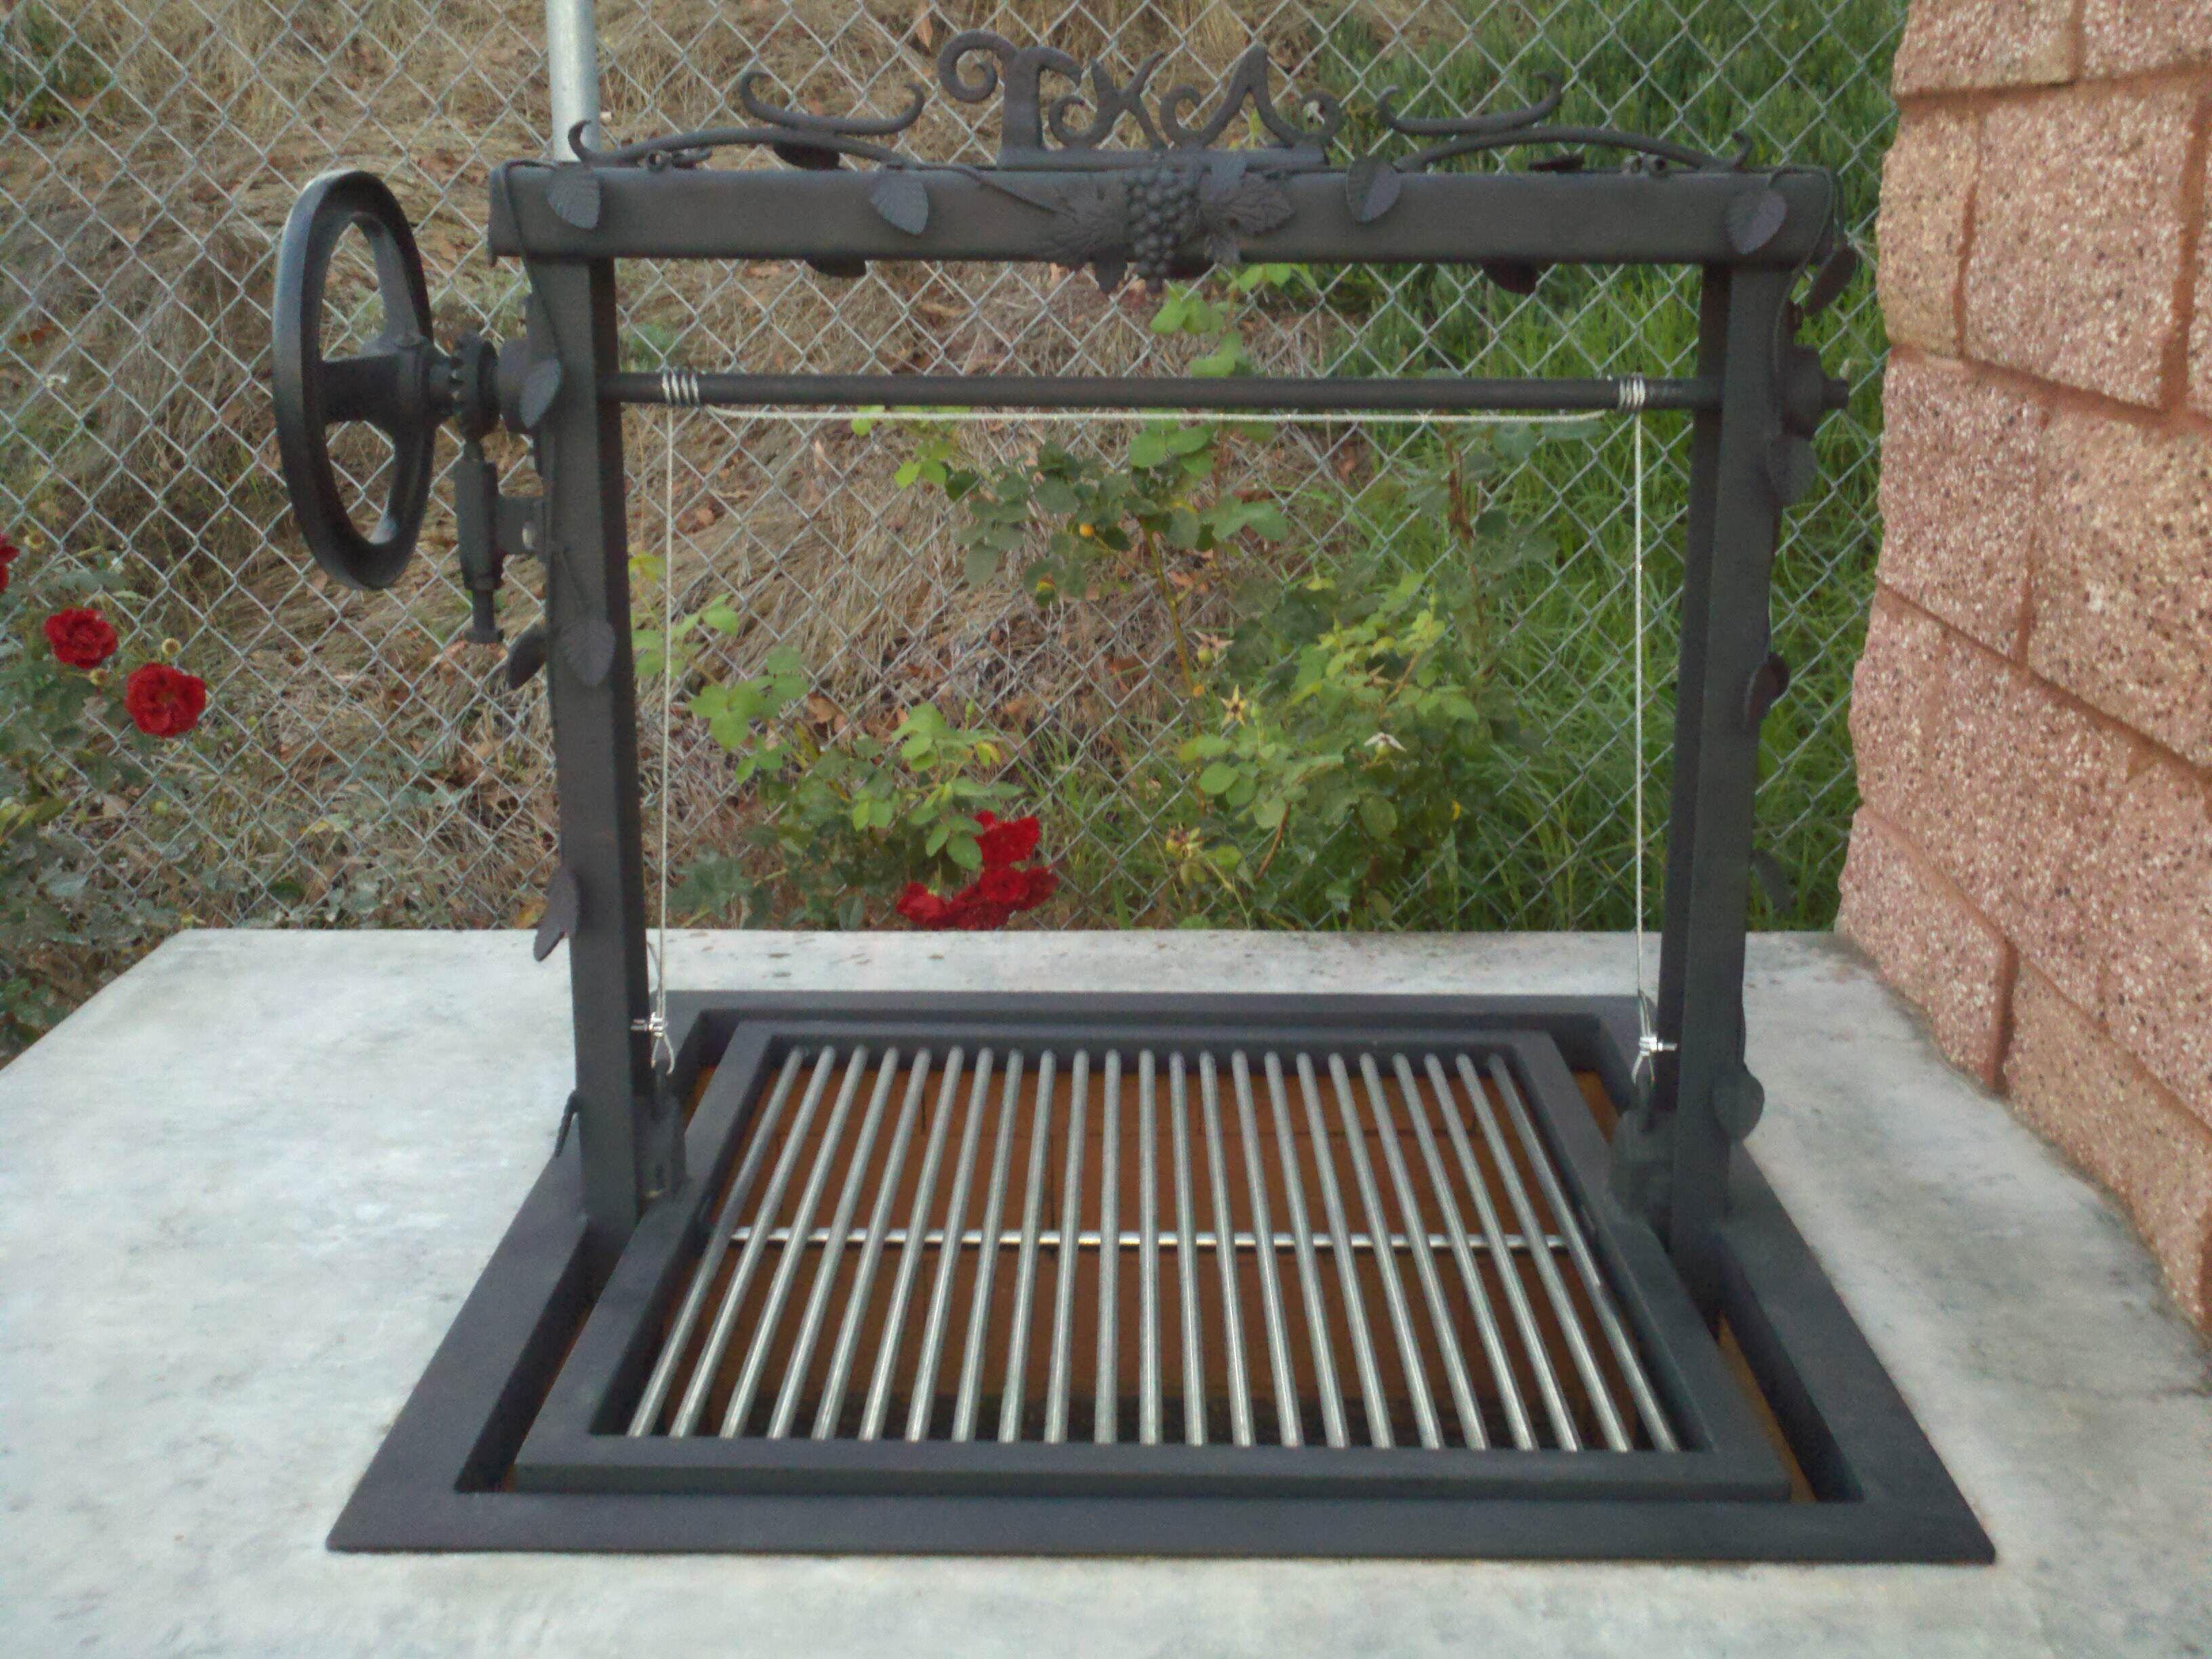 custom santa maria grill outdoor kitchen bars high heat paint outdoor bbq on zink outdoor kitchen id=99097